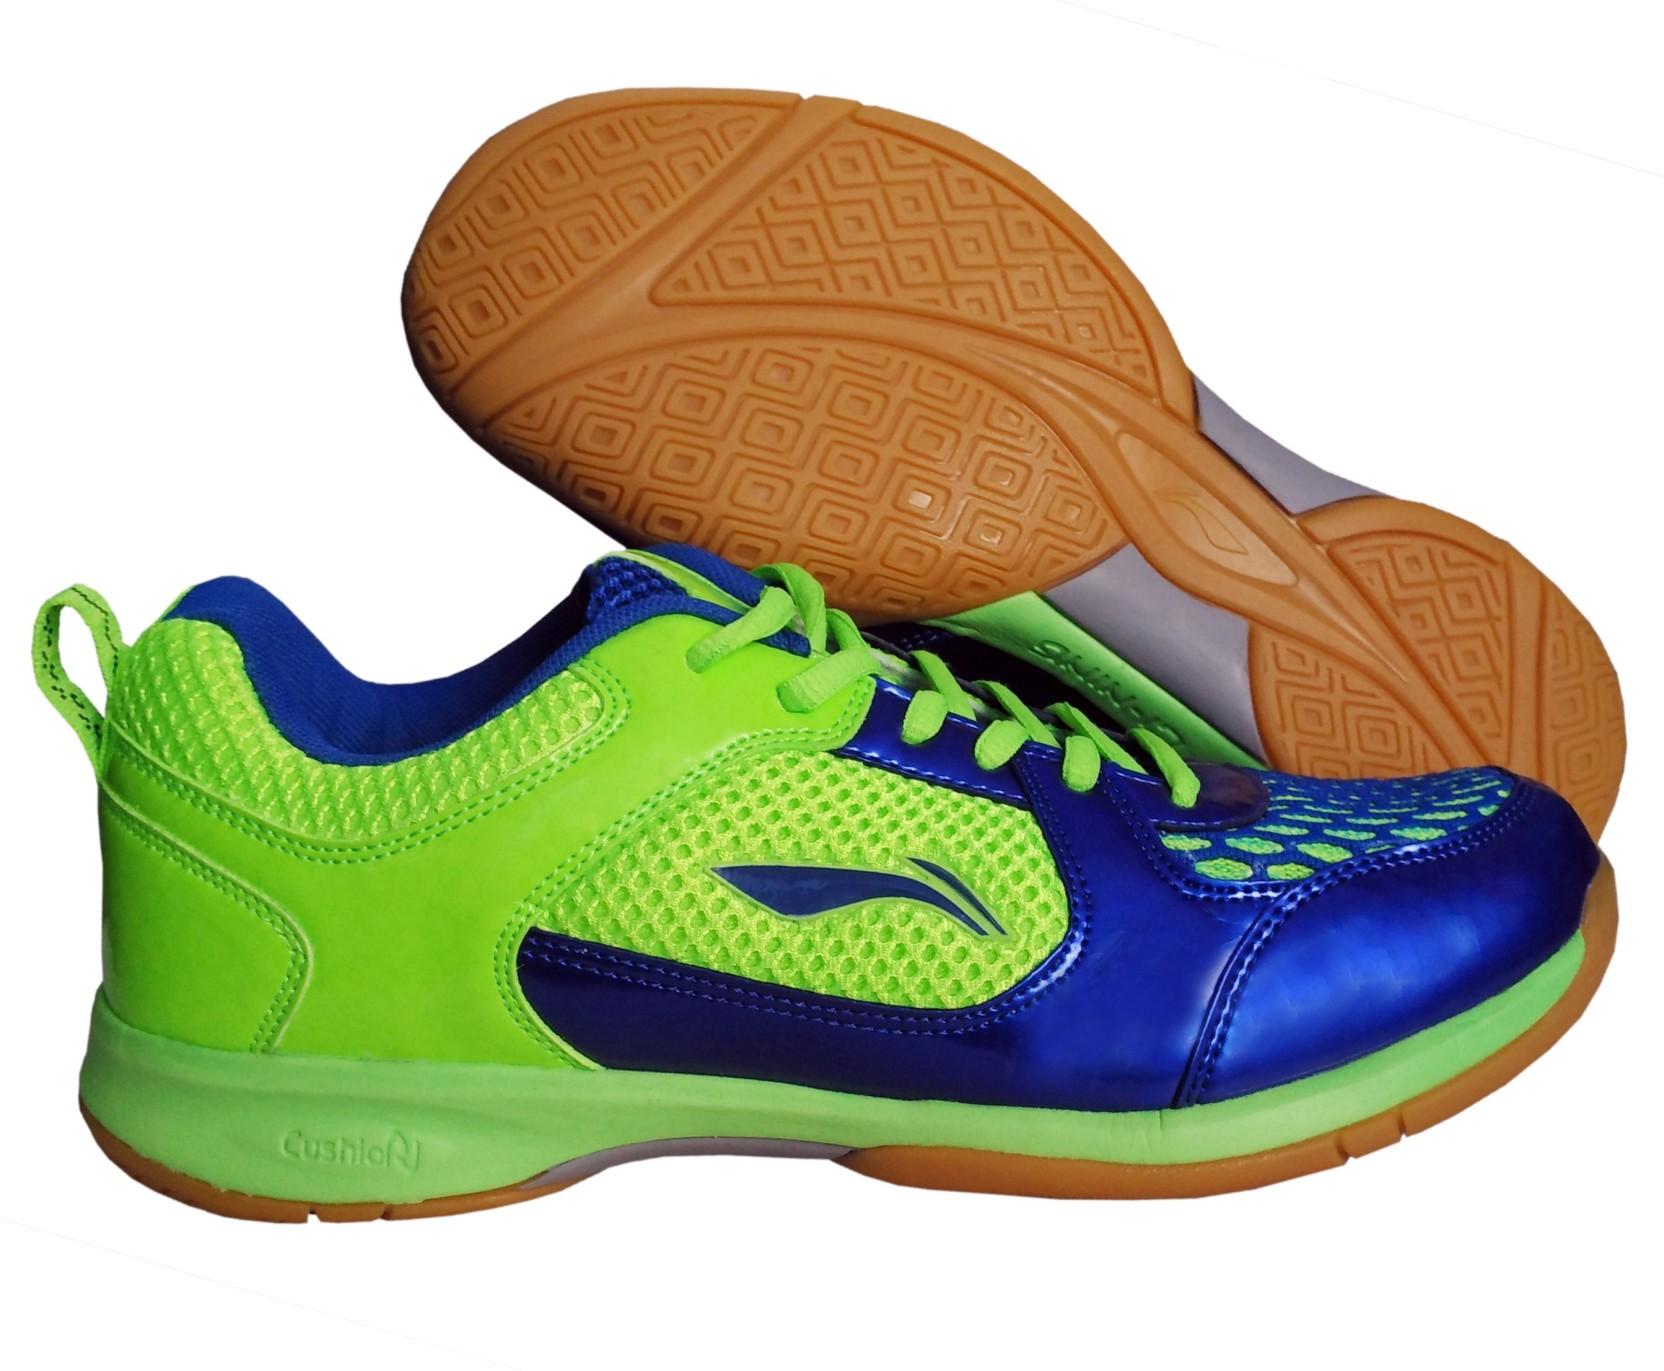 new arrival 320eb 5922e Li-Ning Smart Non Marking Badminton Shoes For Men (Blue, Green)